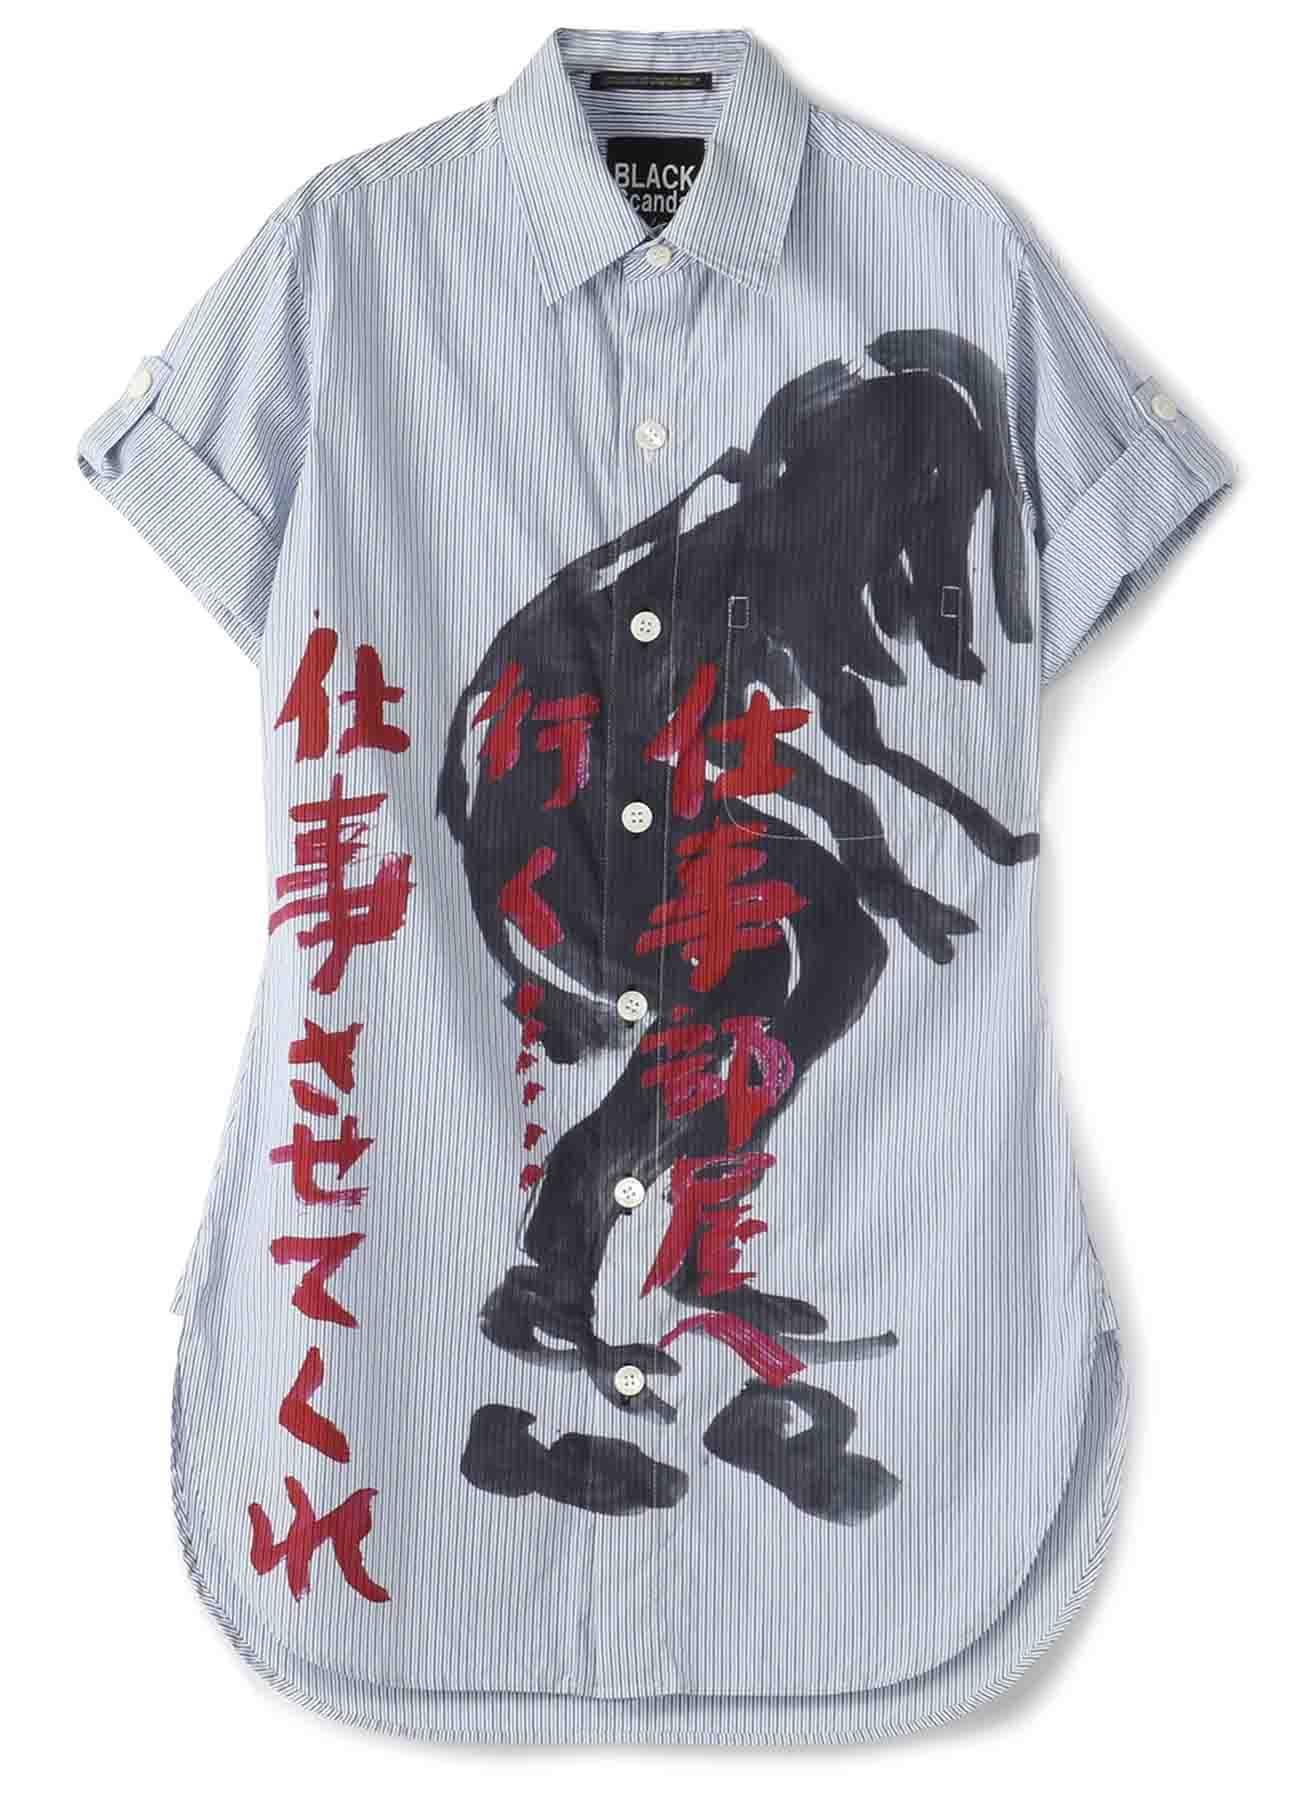 BLACK Scandal ショートスリーブストライプメッセージプリントシャツ